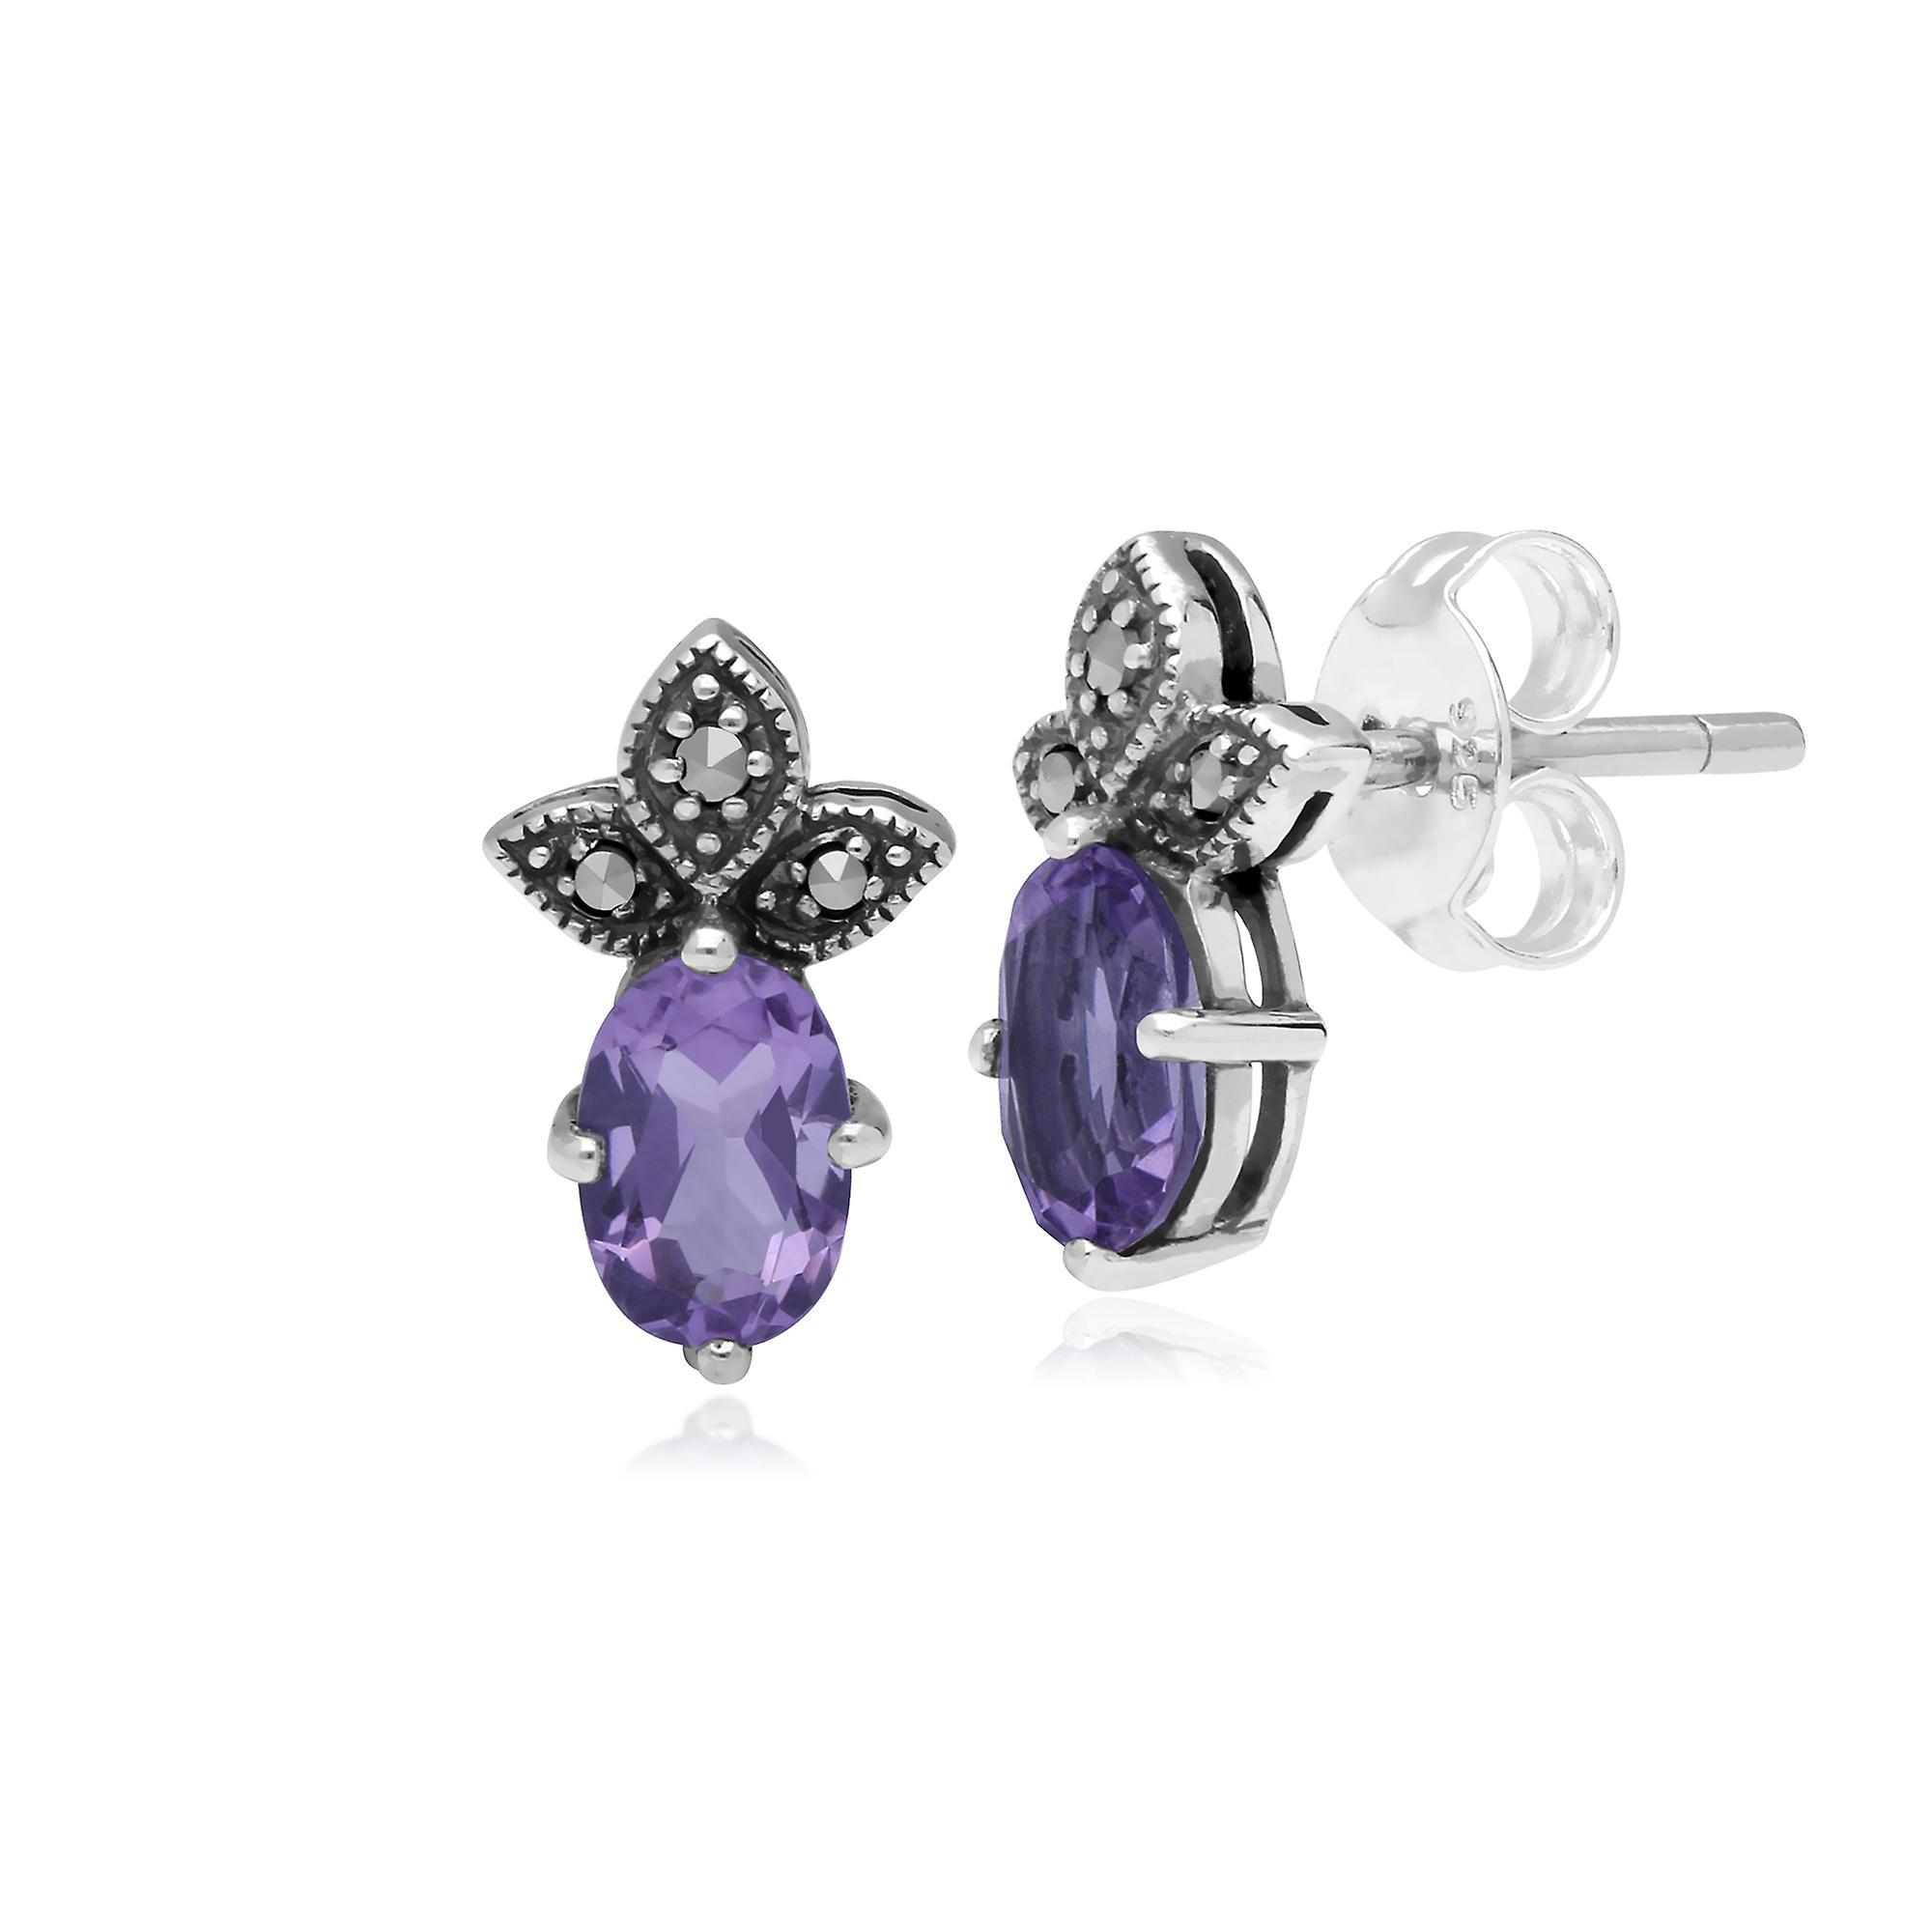 Gemondo Sterling Silver Amethyst & Marcasite February Stud Earrings